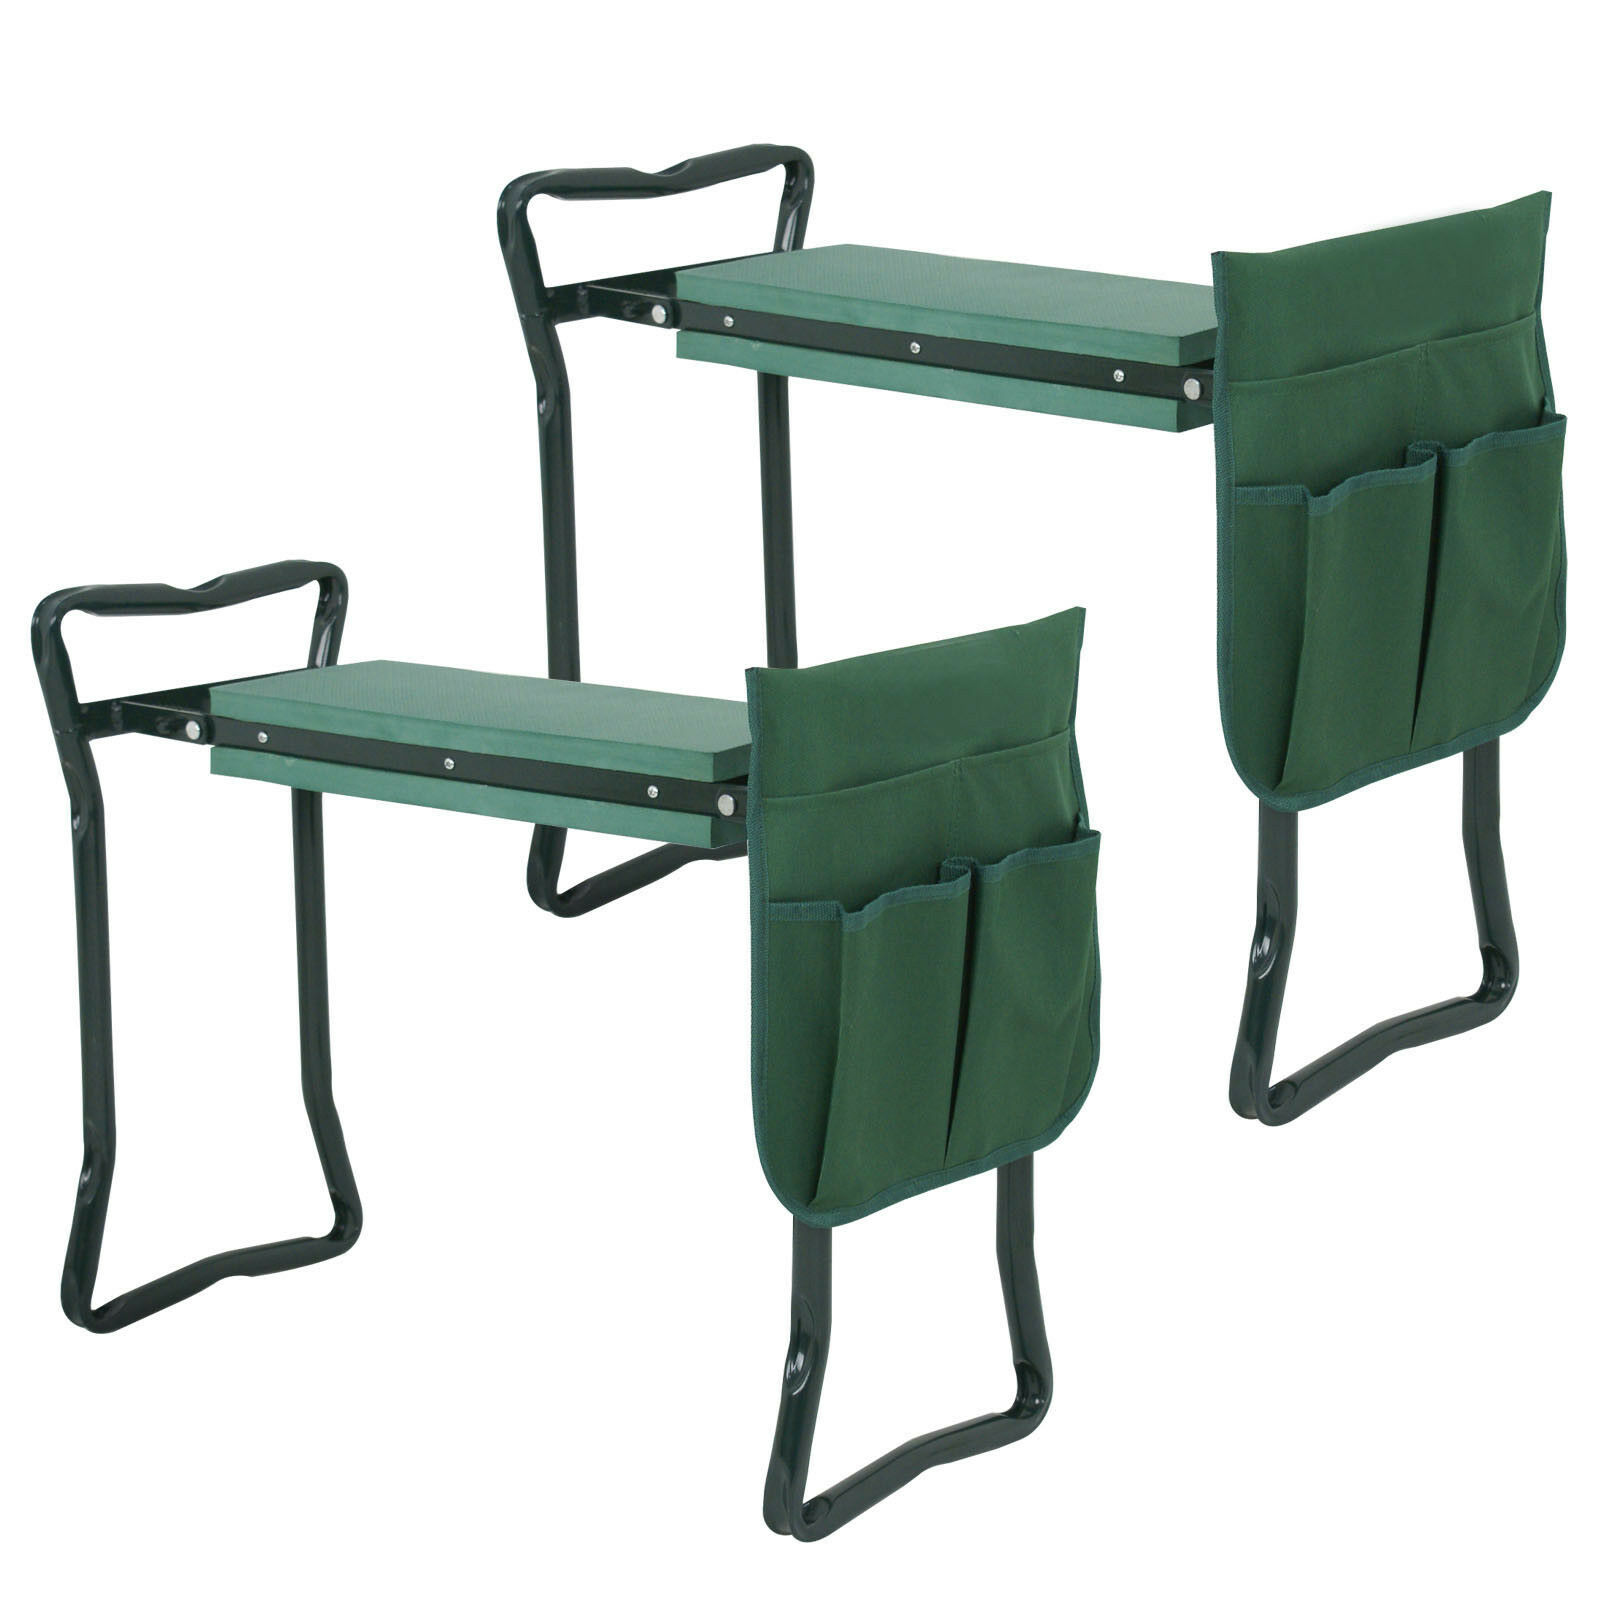 Garden Kneeler Gardener Kneeling 2X Folding Pad & Cushion Seat Knee Pad Seat Garden Clothing & Protective Gear